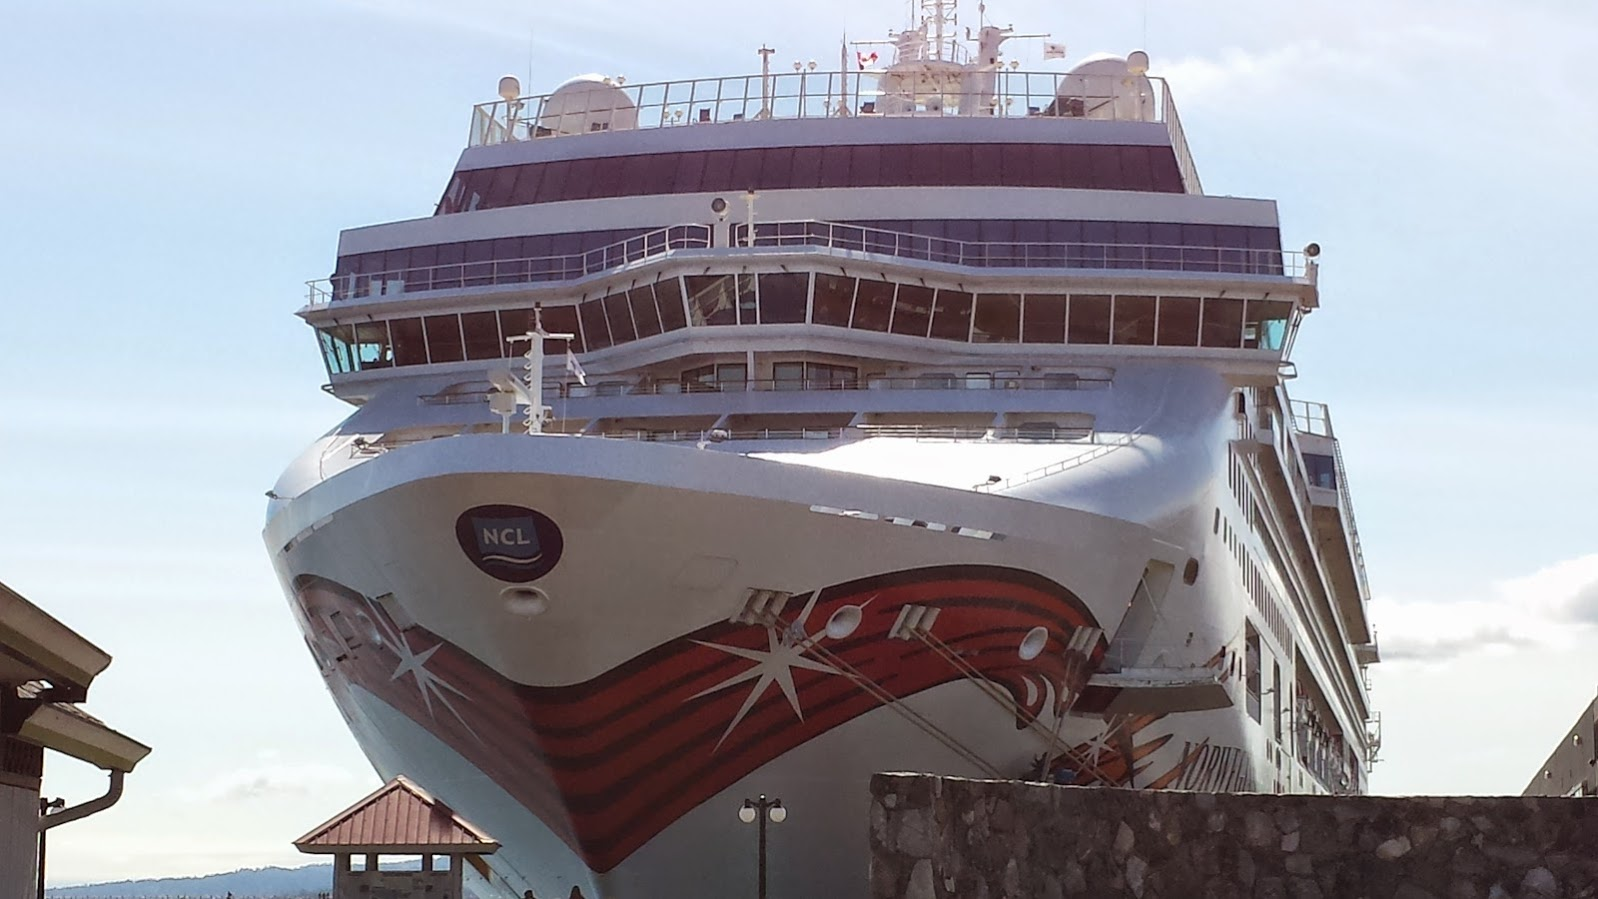 Norwegian Cruise Lines - NCL